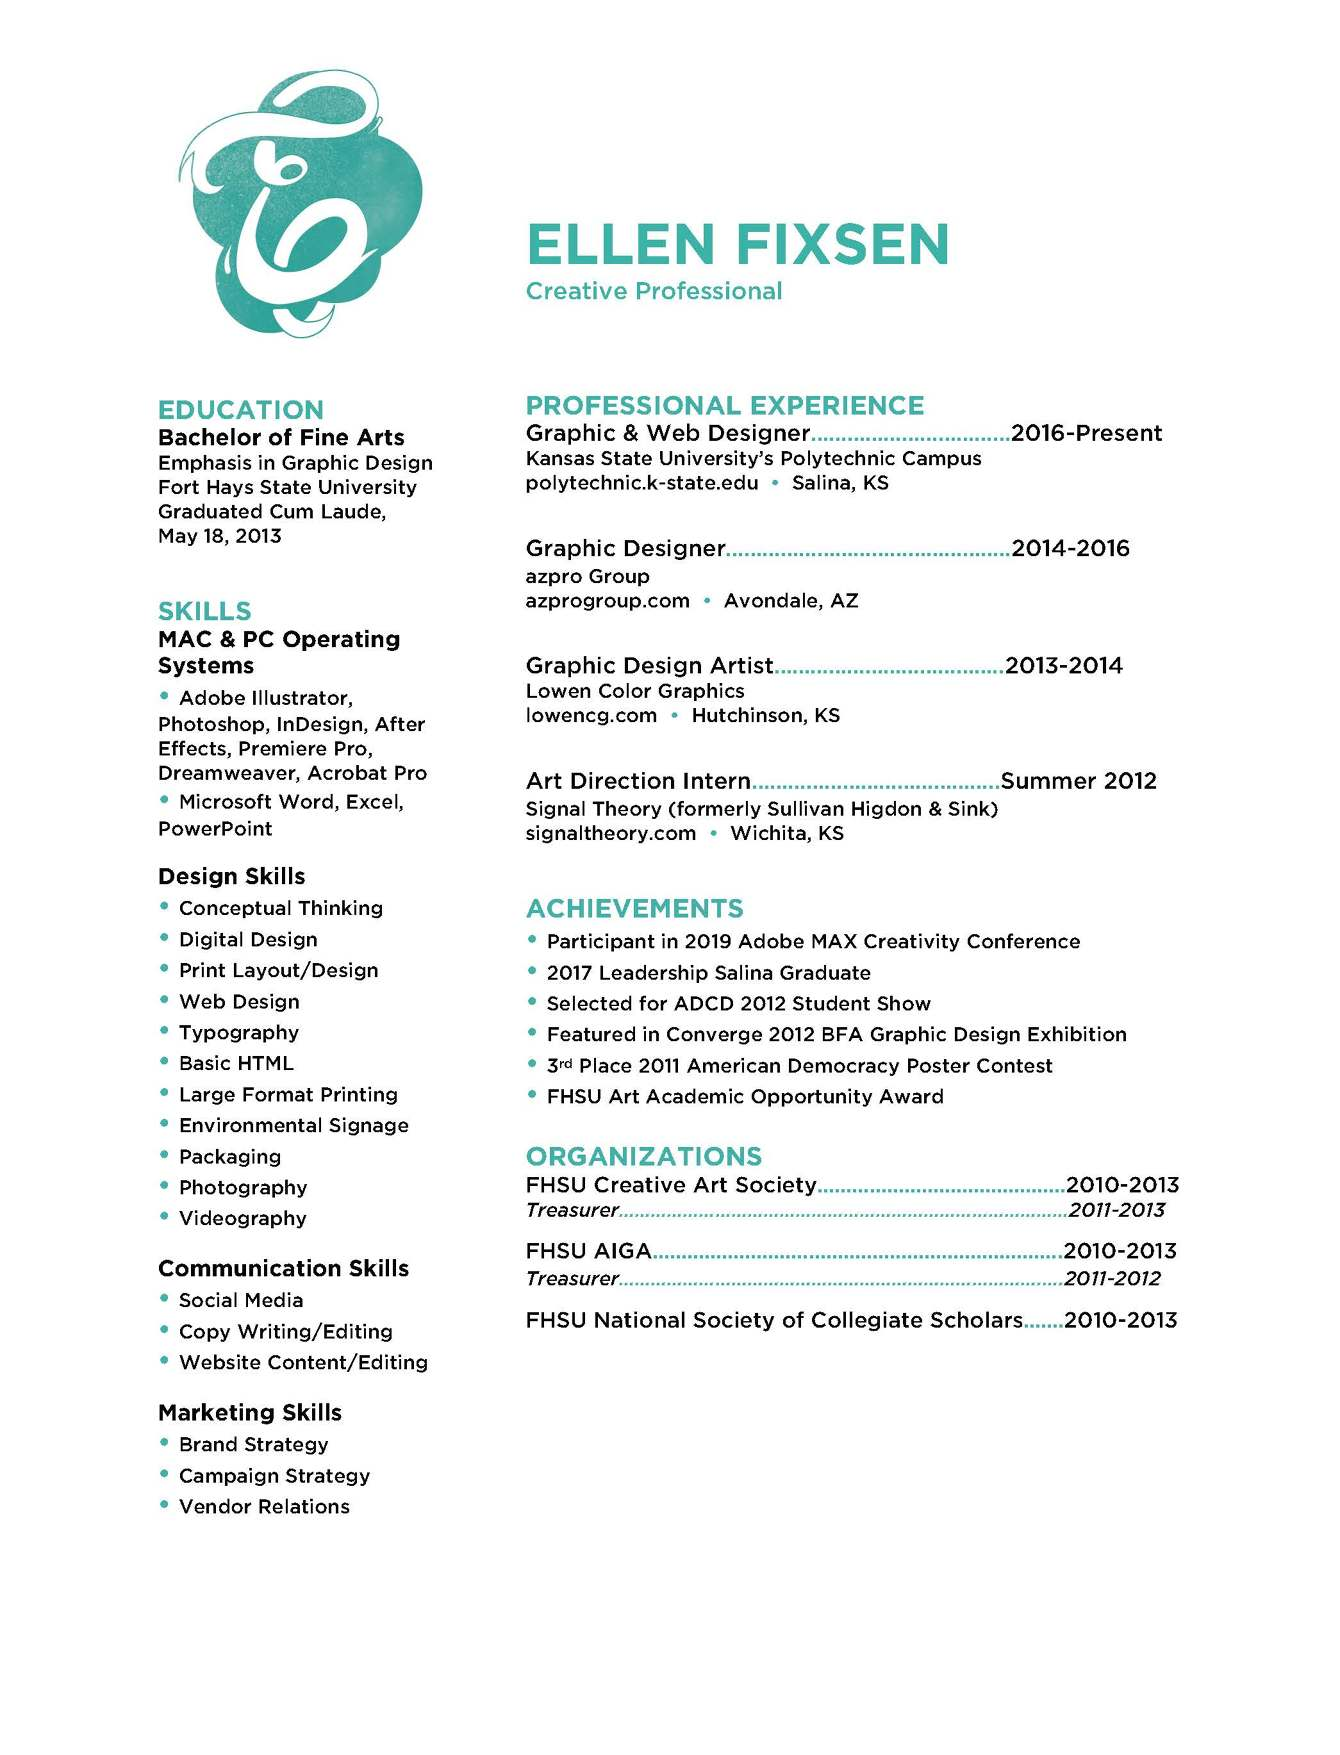 Education Experience Ellen Fixsen